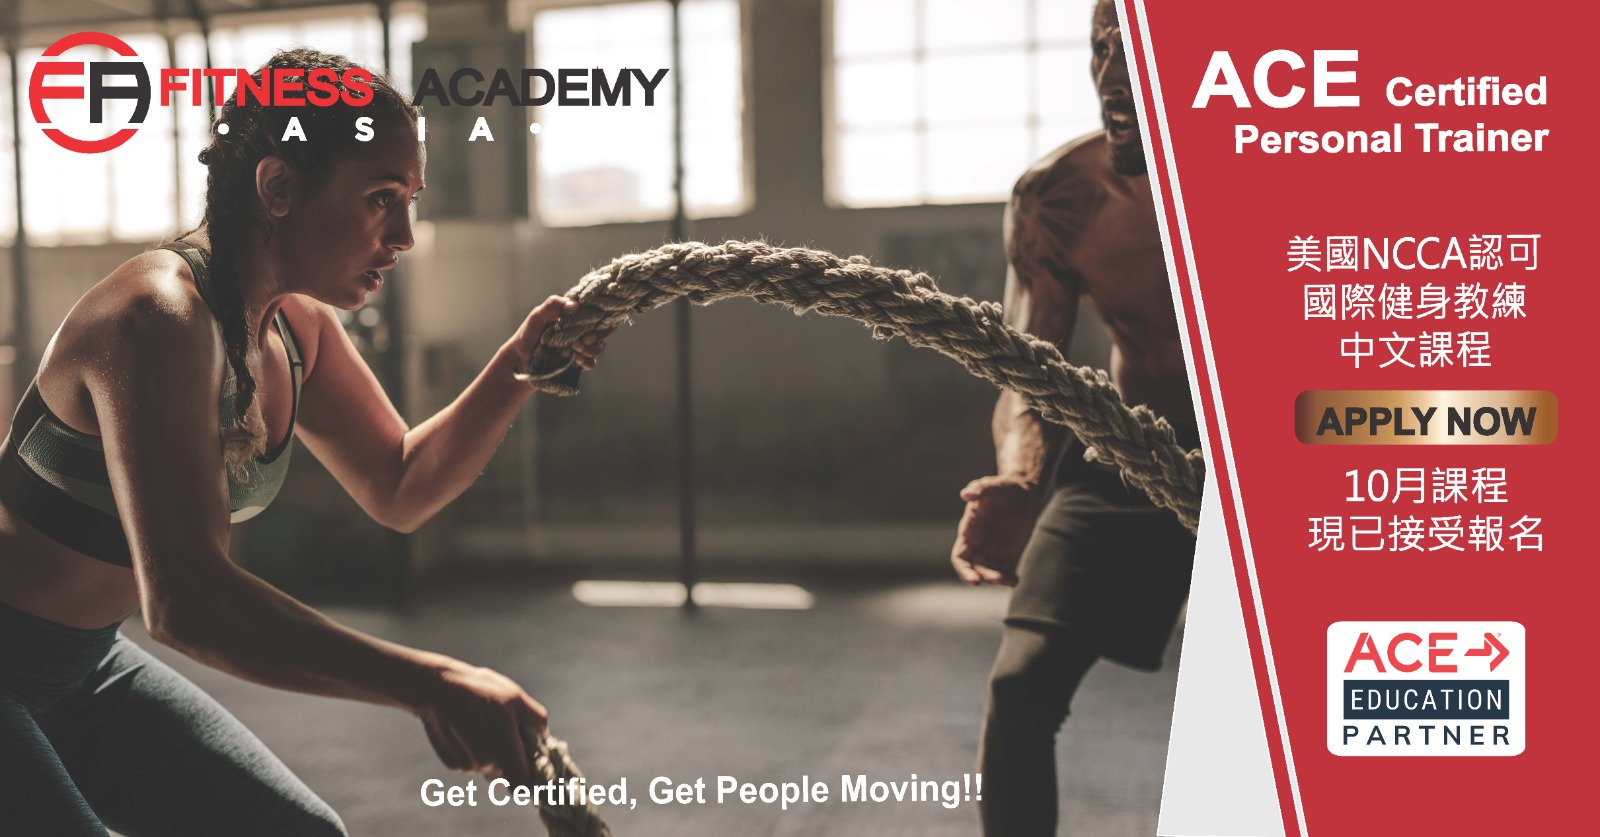 Fitness Academy Asia